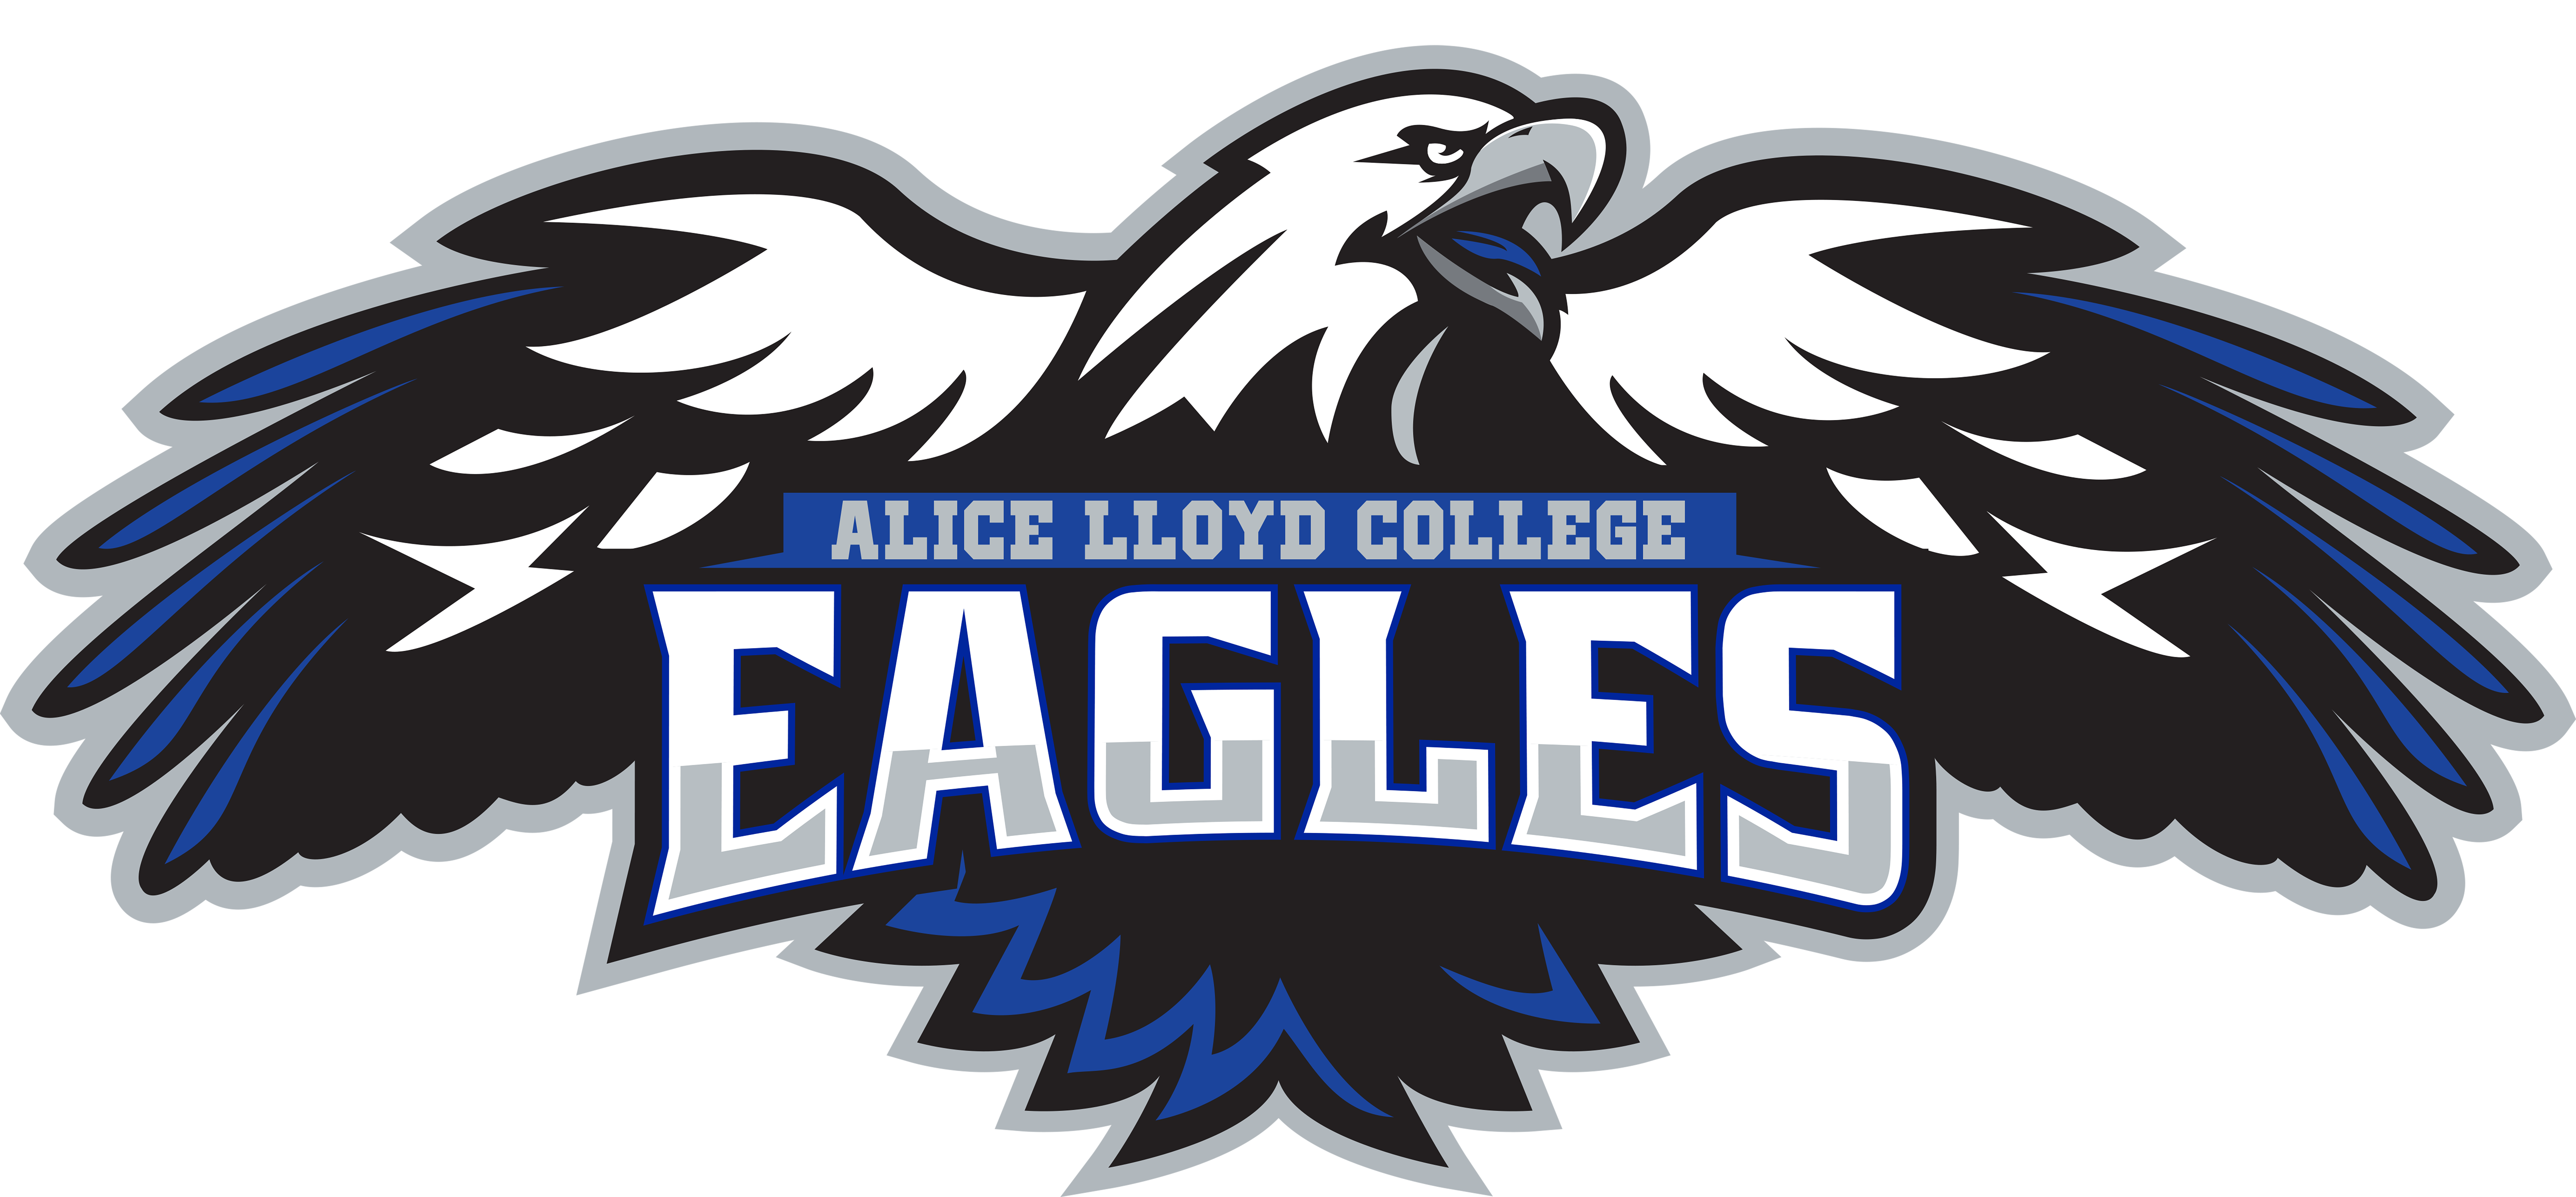 Eagle clipart cheerleader. Athletics alice lloyd college